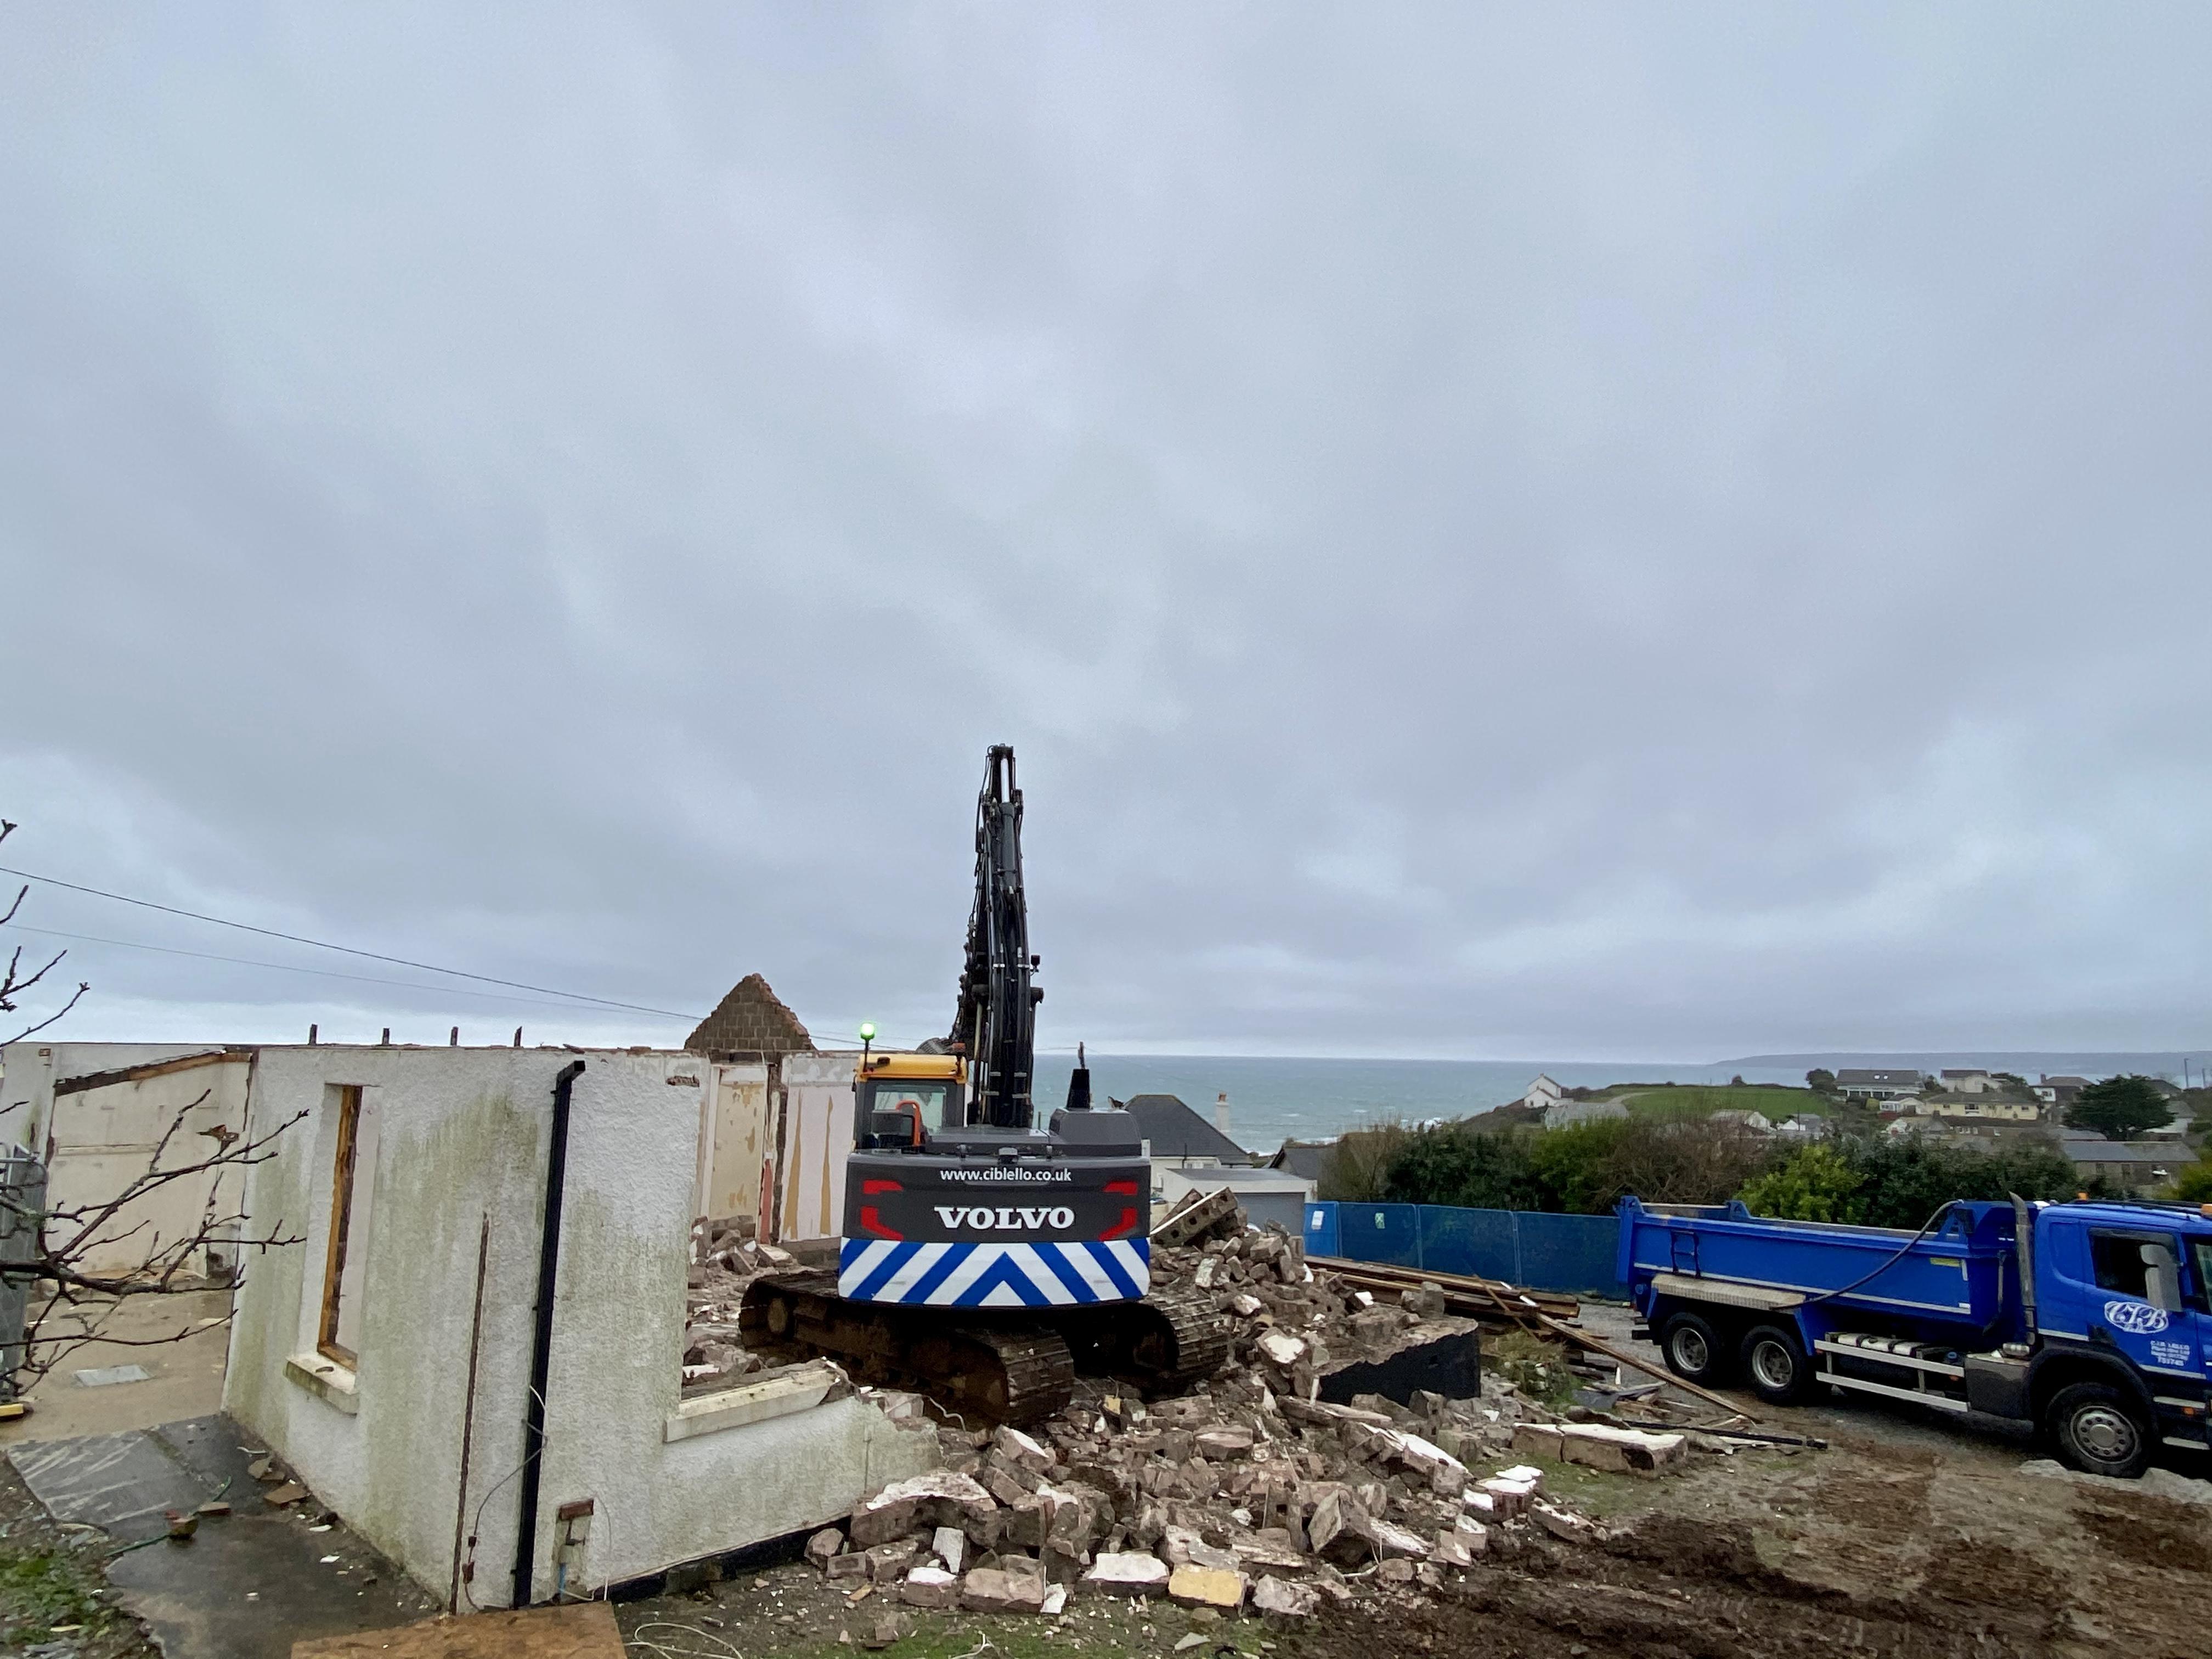 Demolition man at Perranuthoe